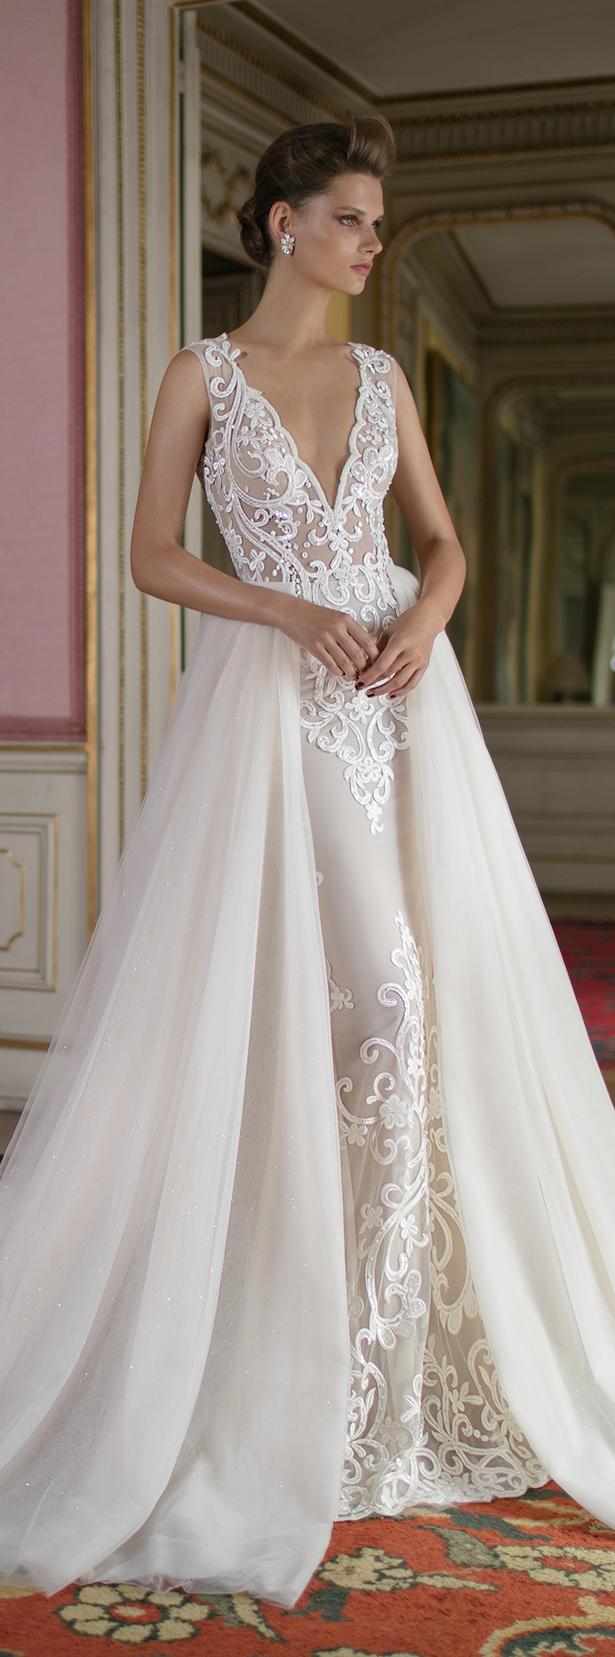 wedding dresses wedding dress skirt Archive for category Wedding Dresses